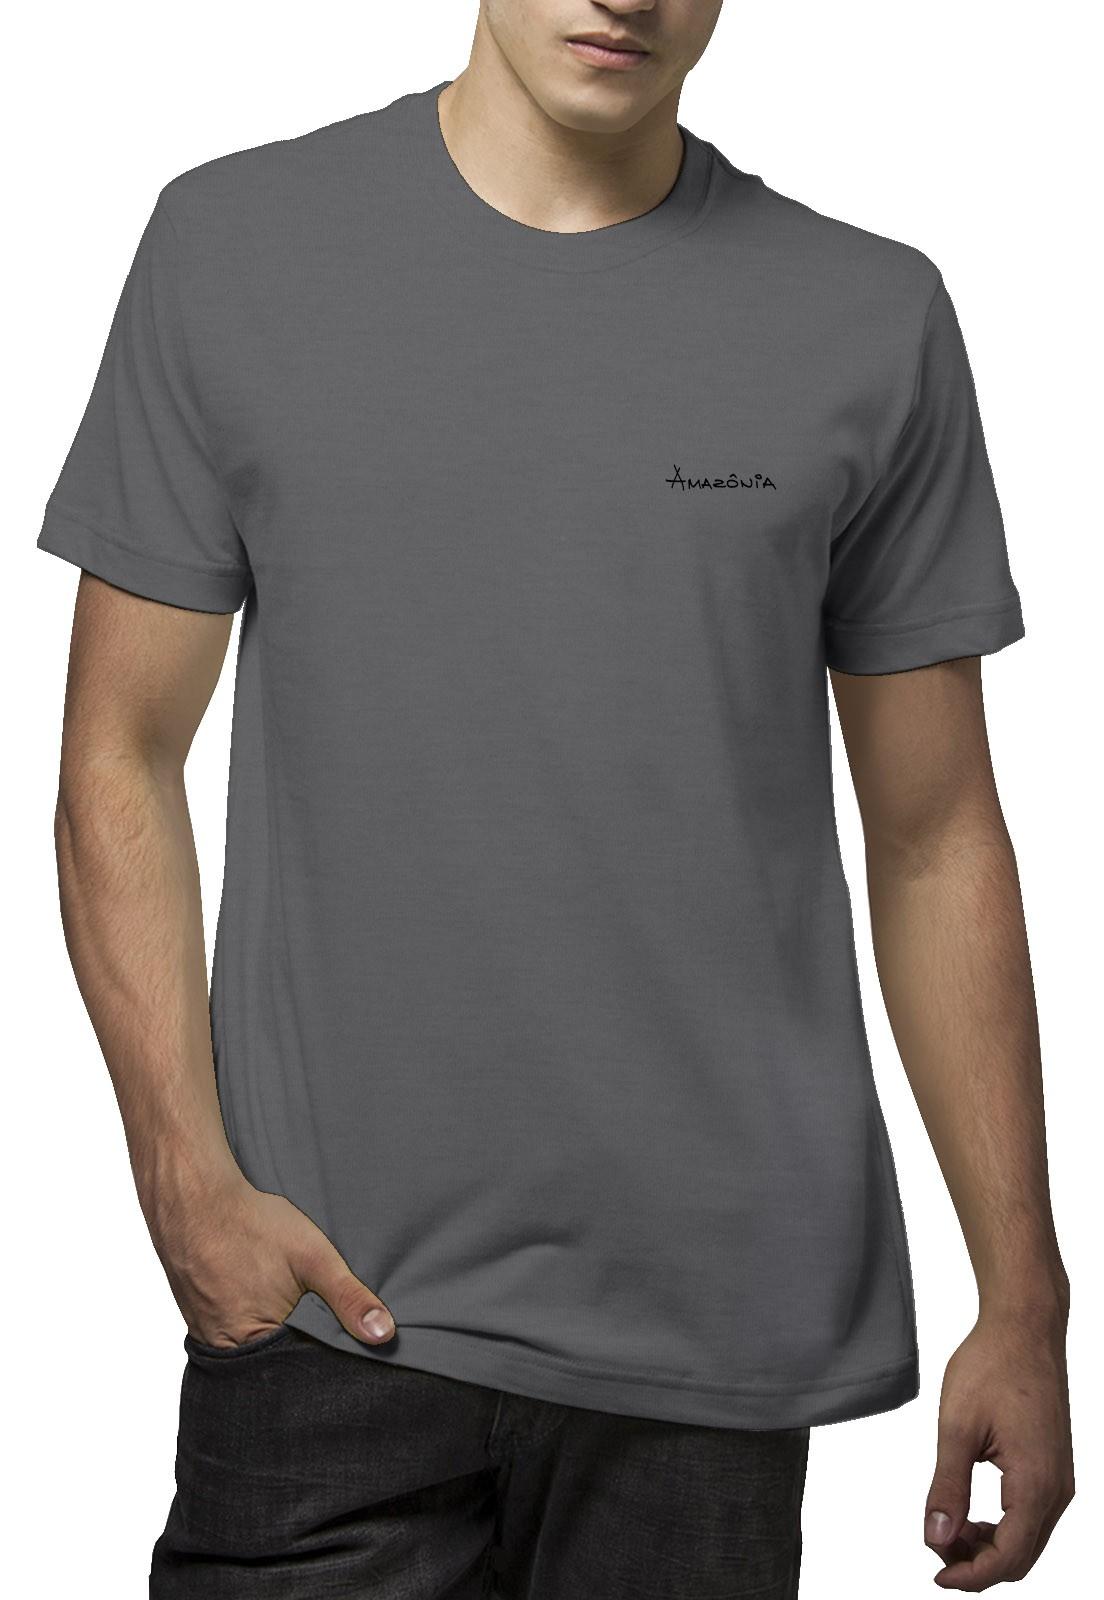 Camiseta Amazônia Flor Roots - Mescla Escuro